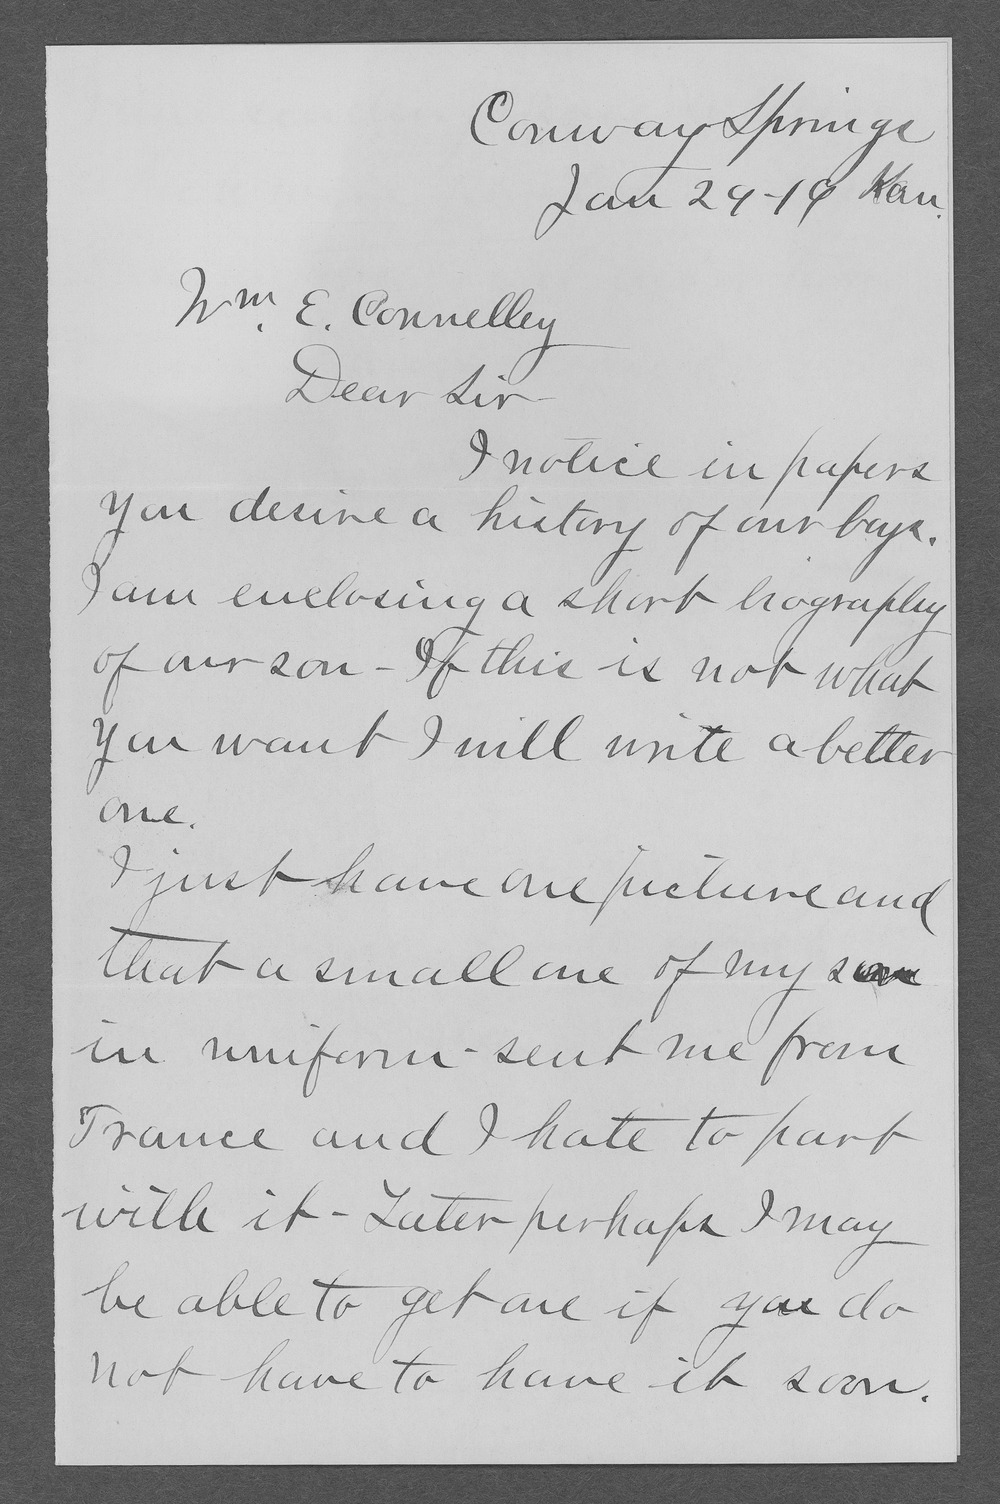 Robert C. McIlhenny, World War I soldier - 6